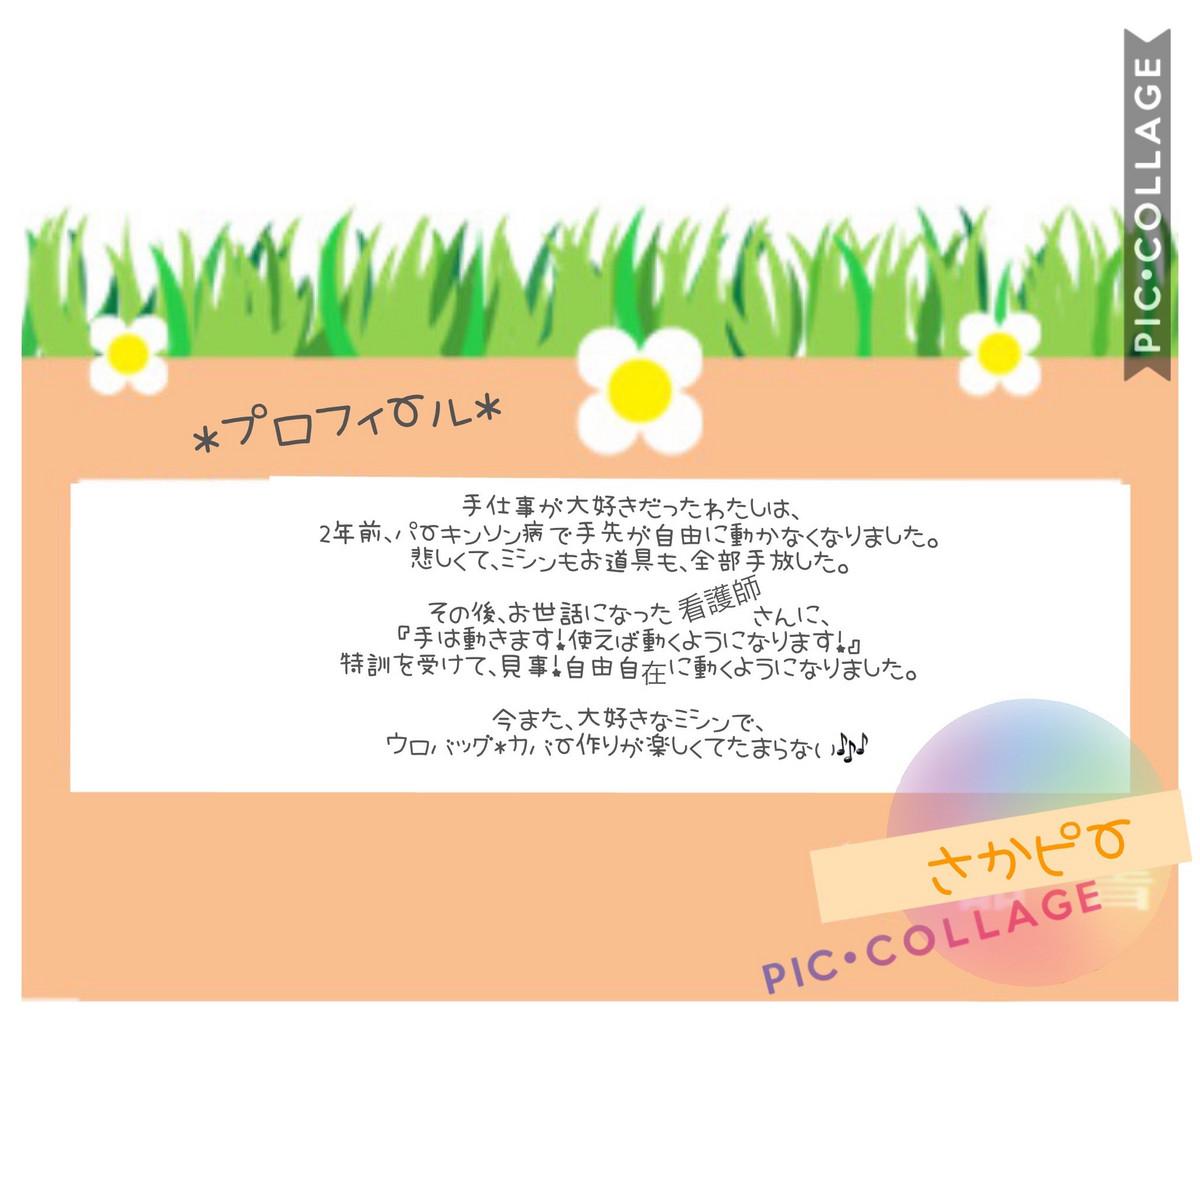 Img_0155